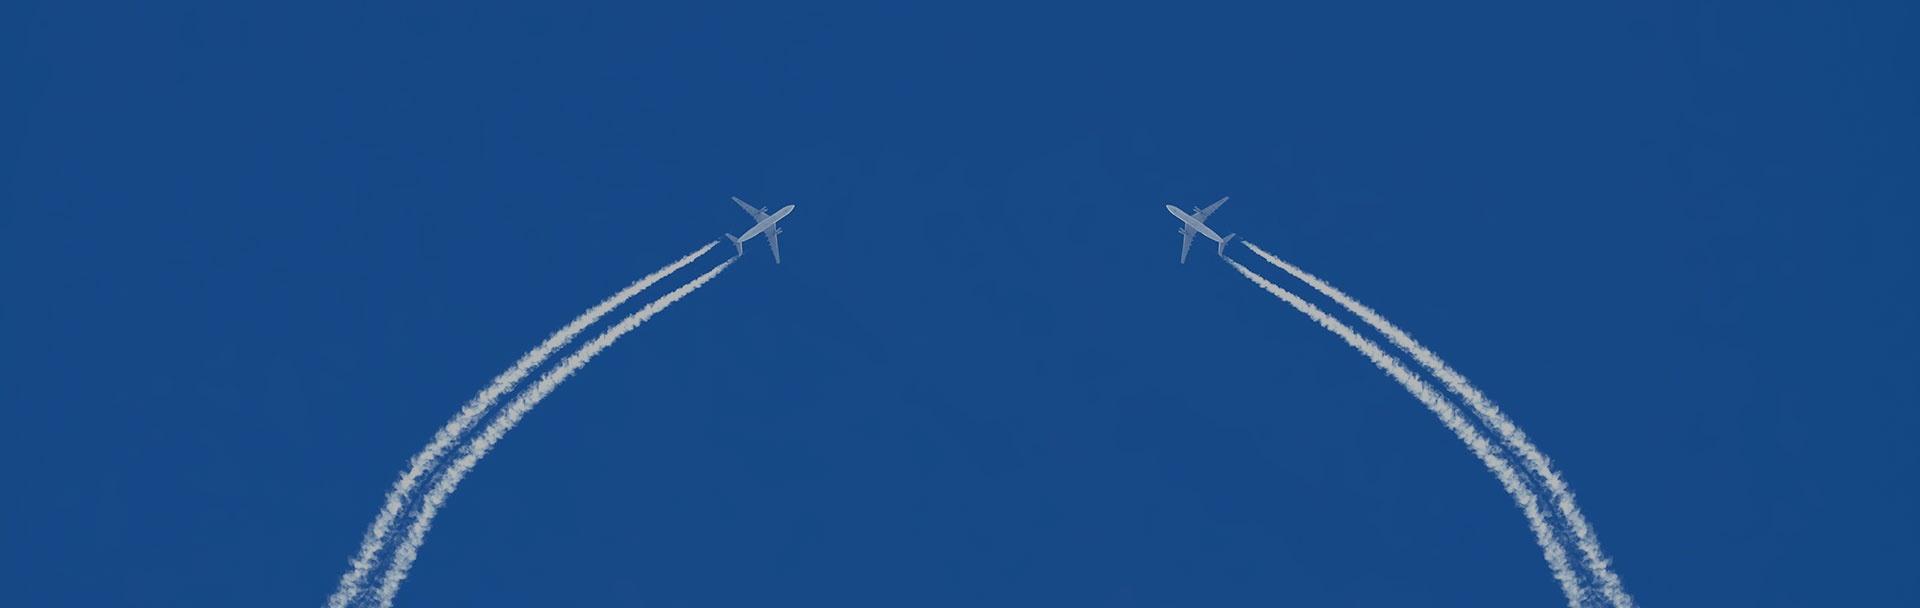 mid-air-collision-kills-2.jpg